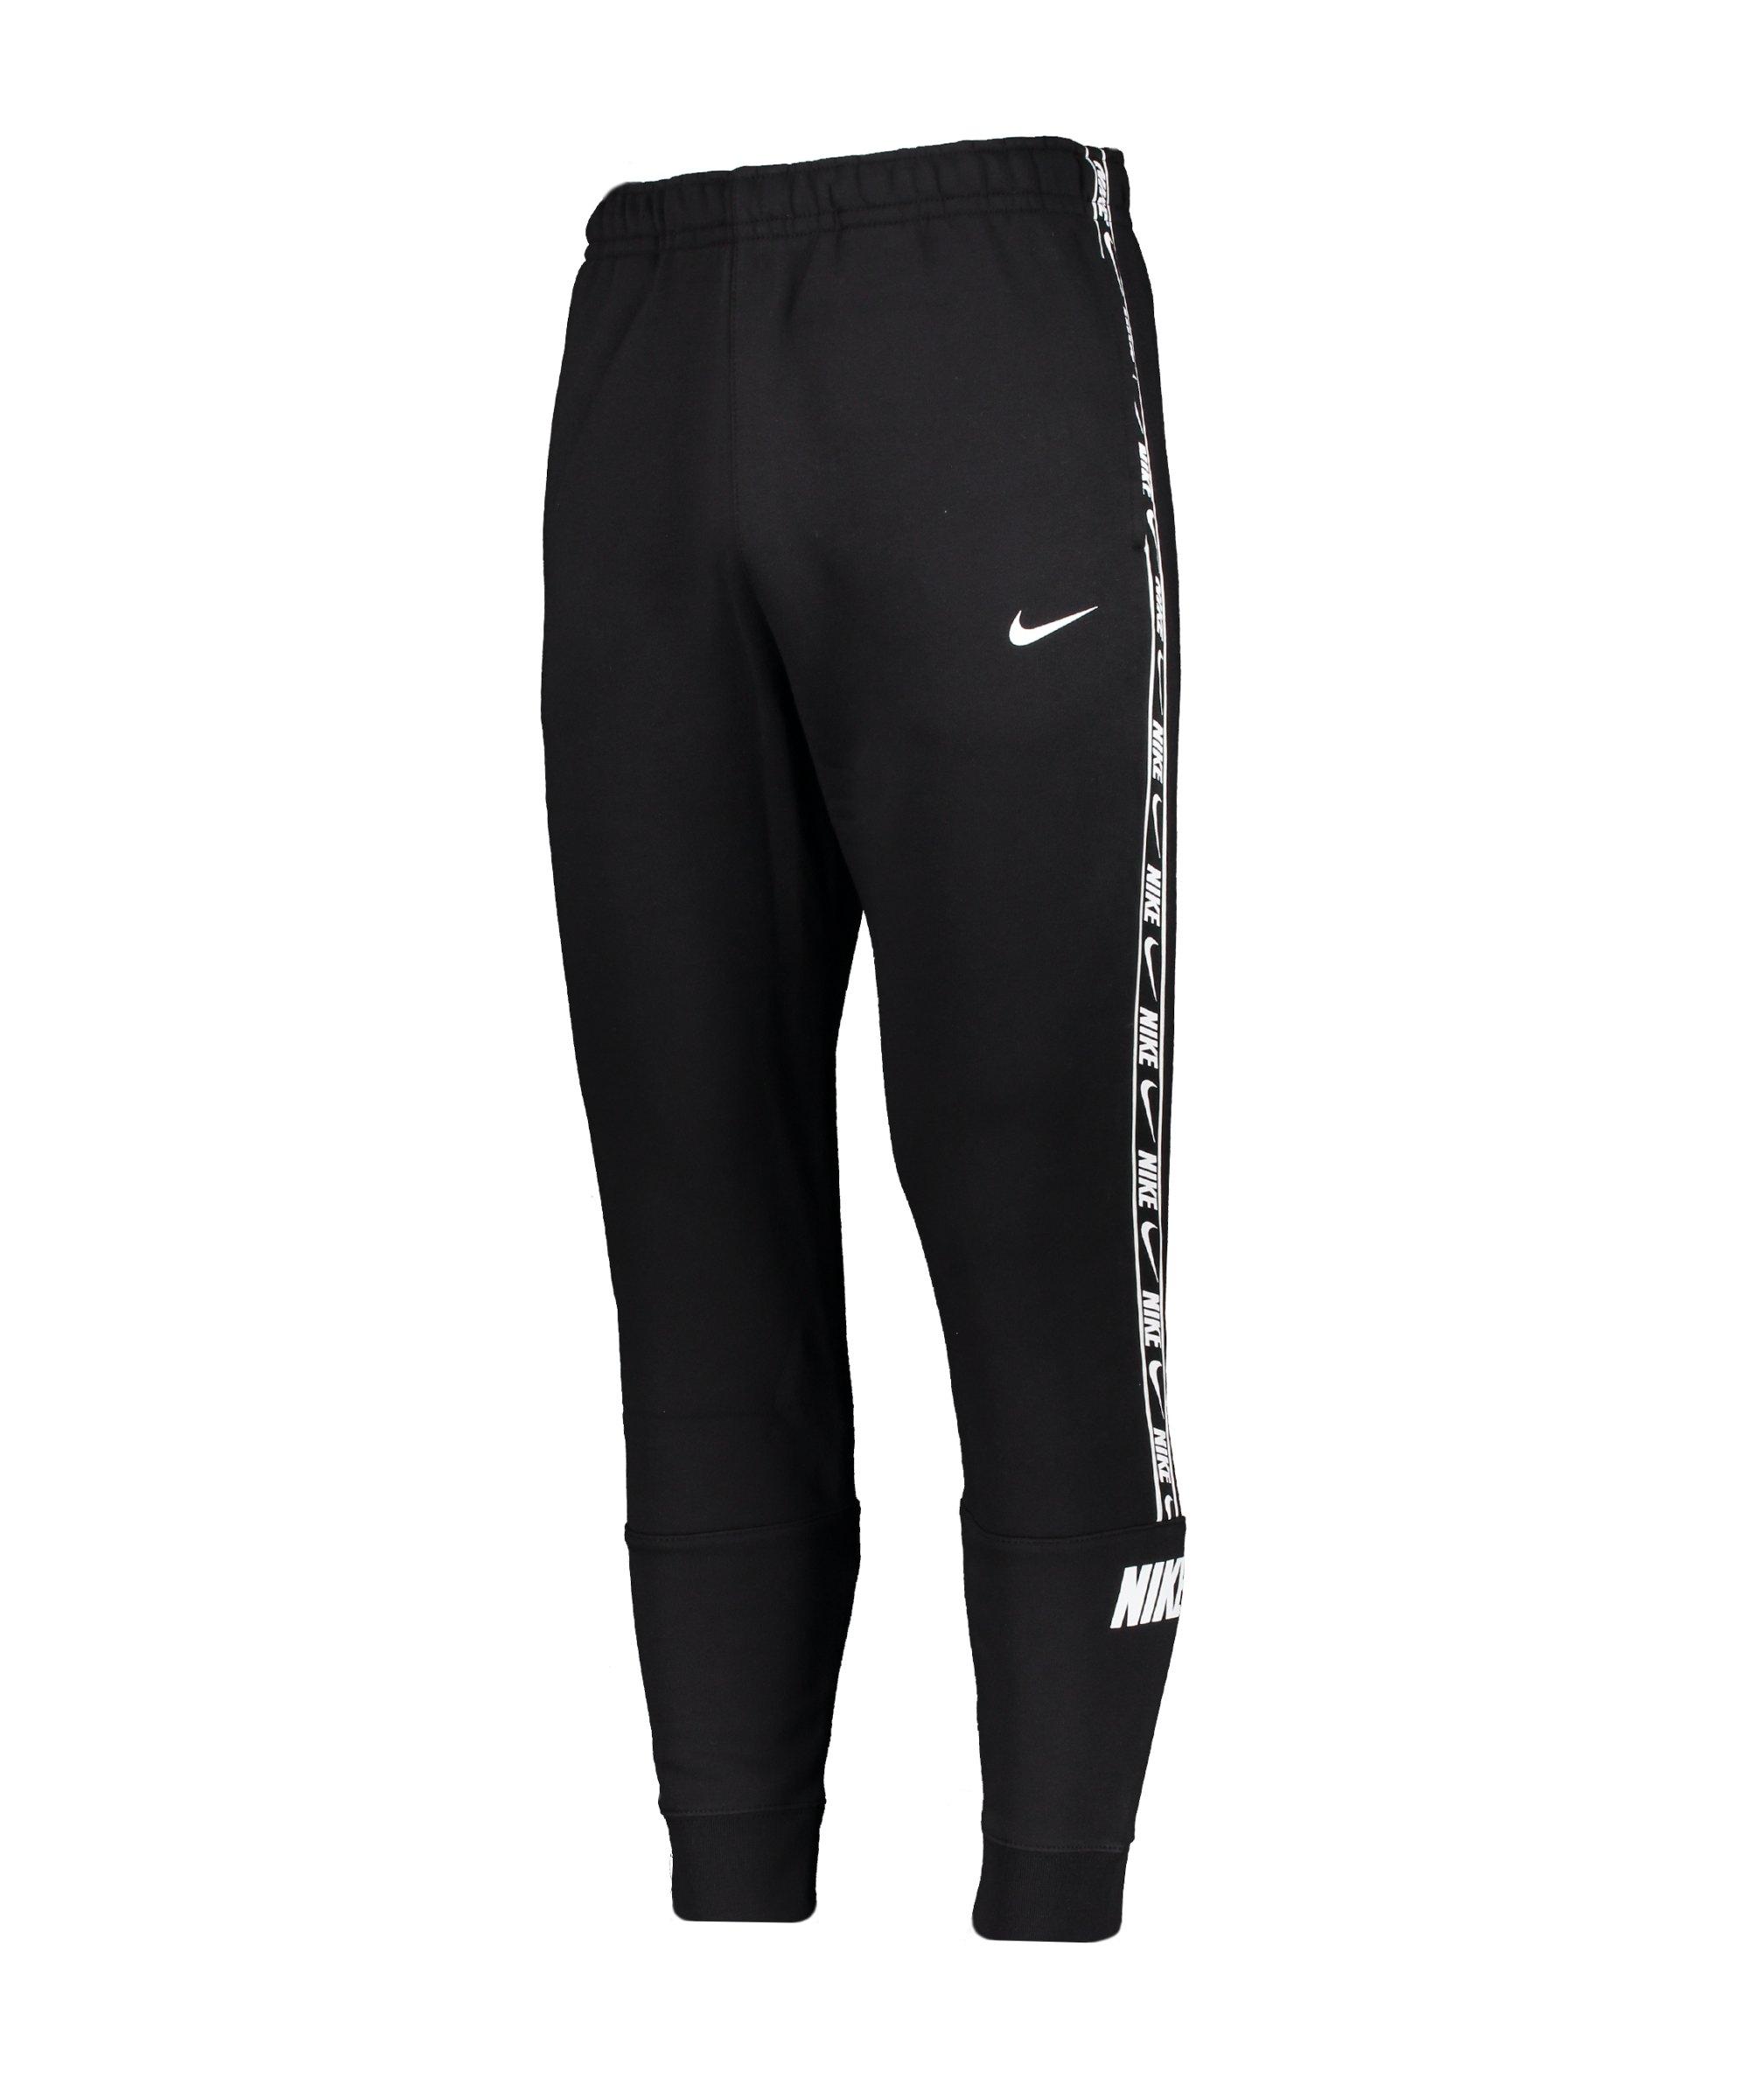 Nike Repeat Fleece Jogginghose Schwarz F011 - schwarz